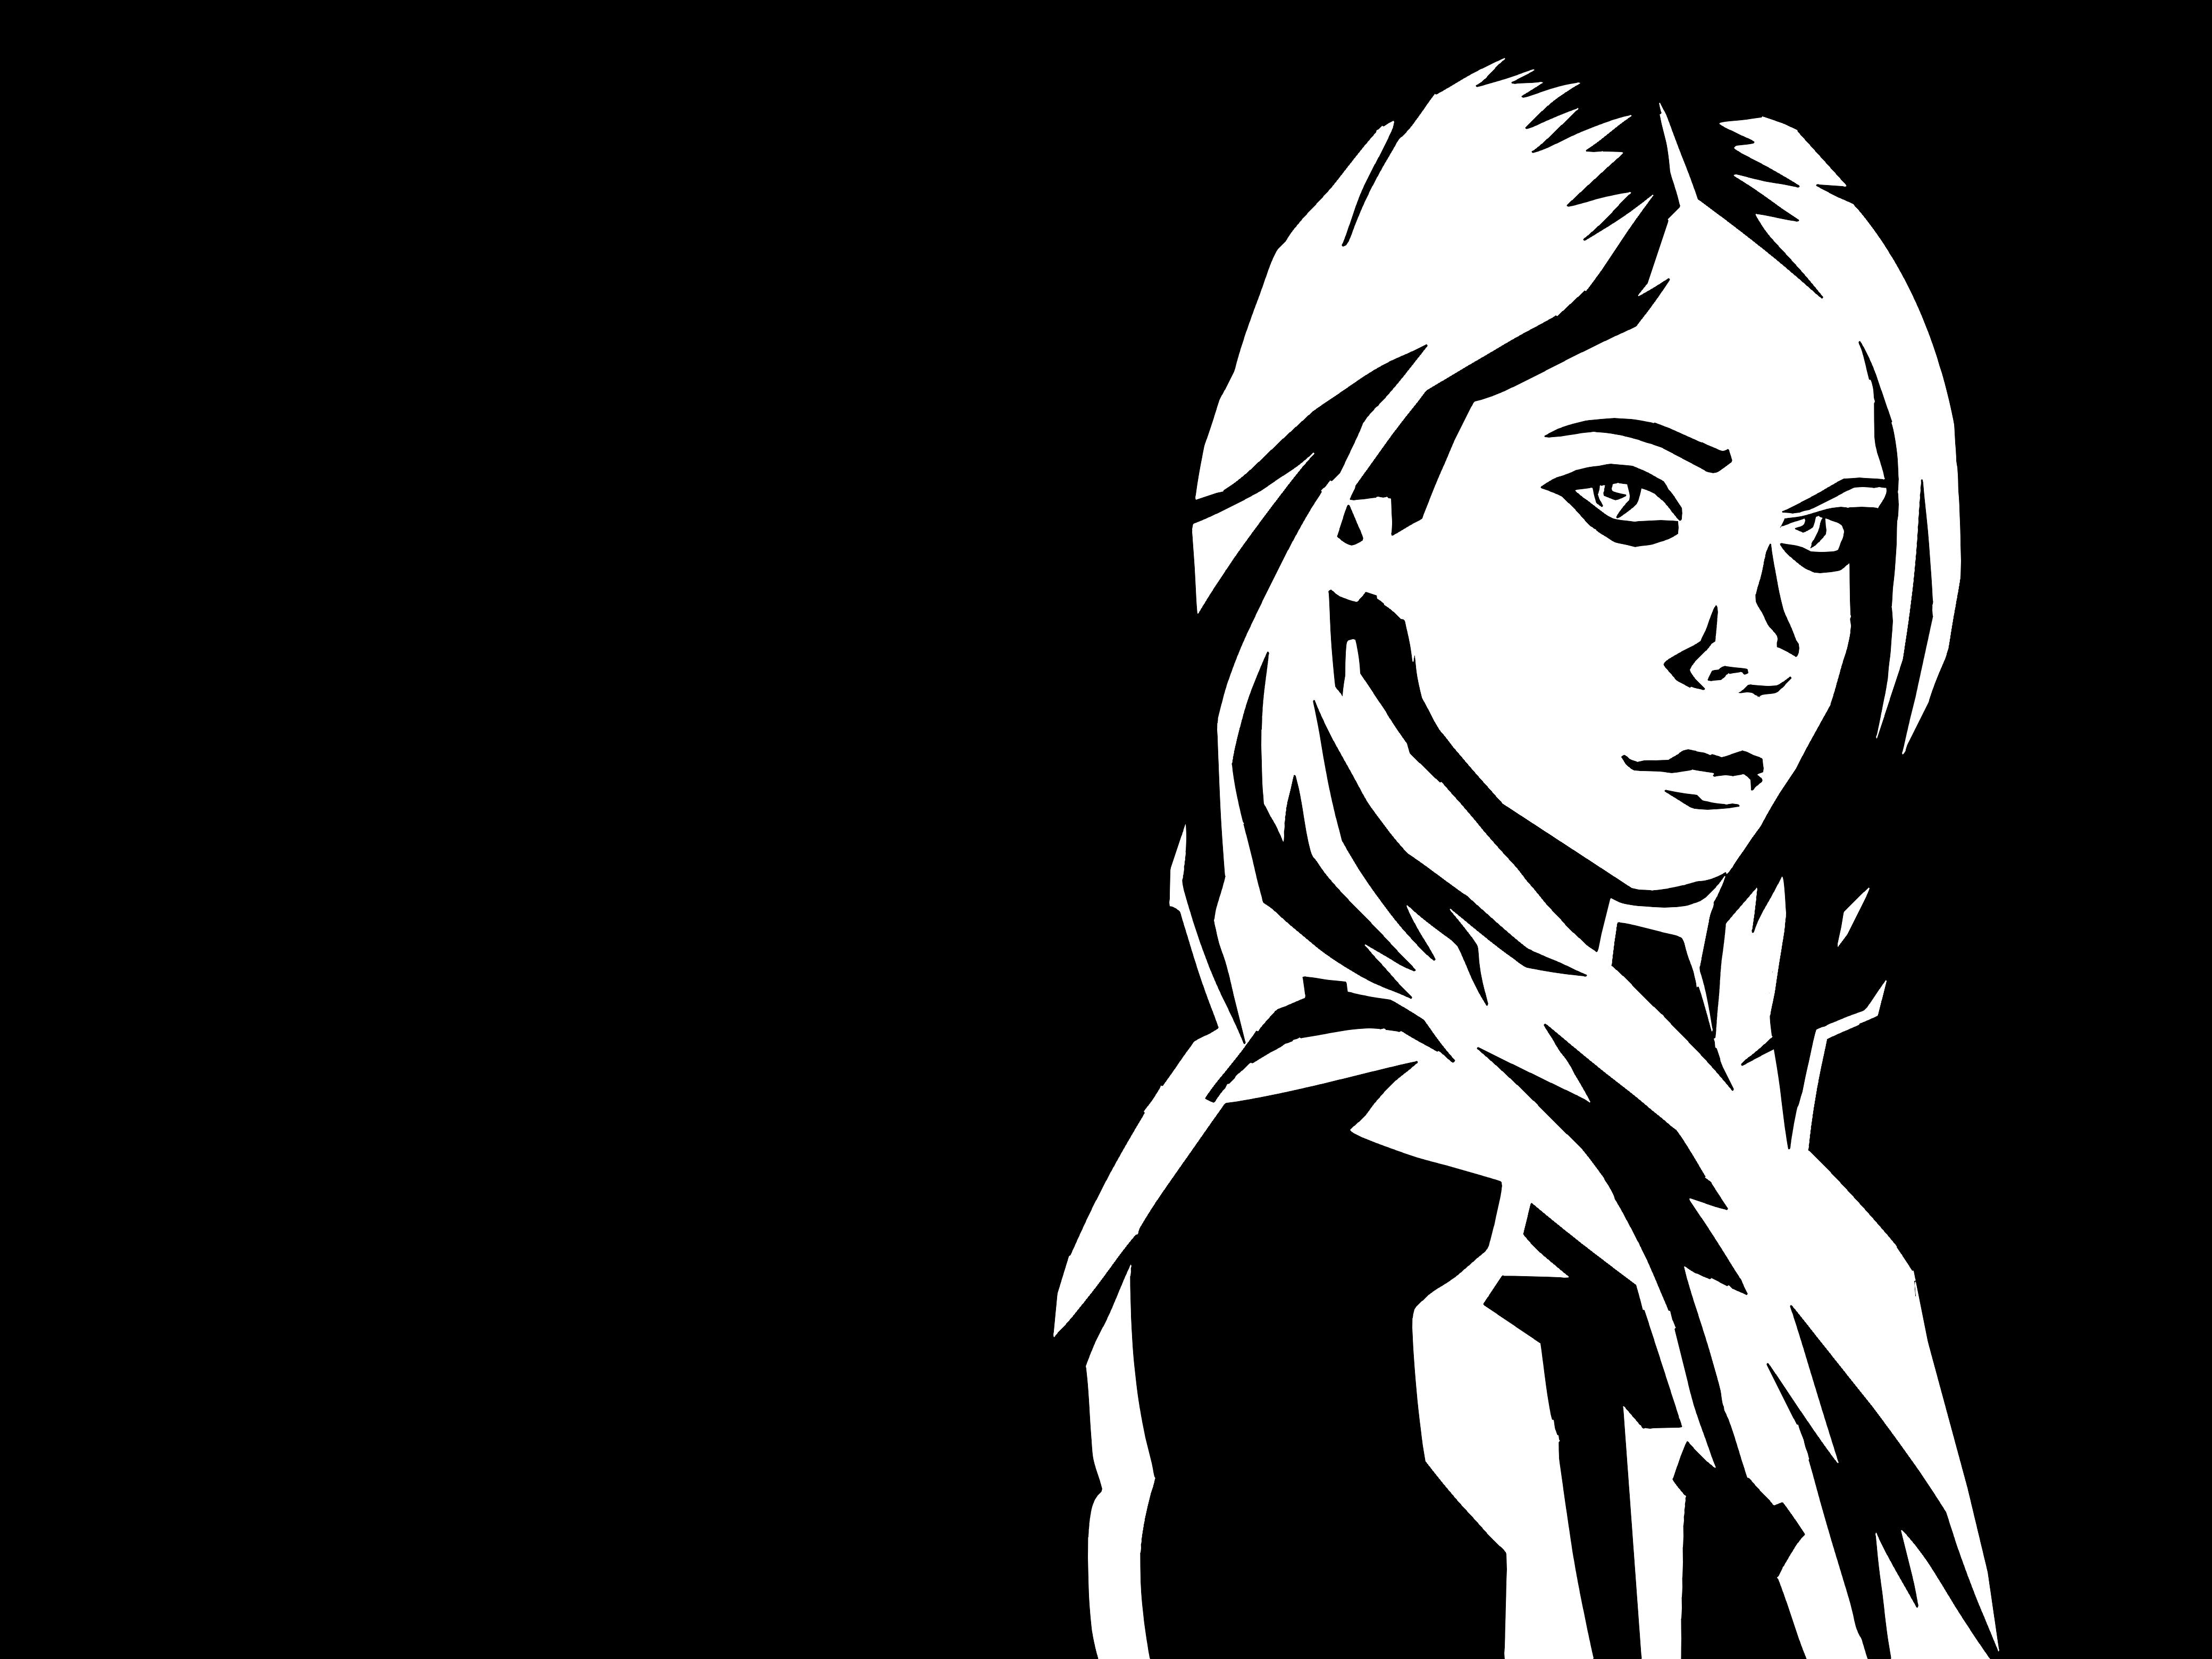 render stiker avril hitam  putih  by ari4811 on DeviantArt